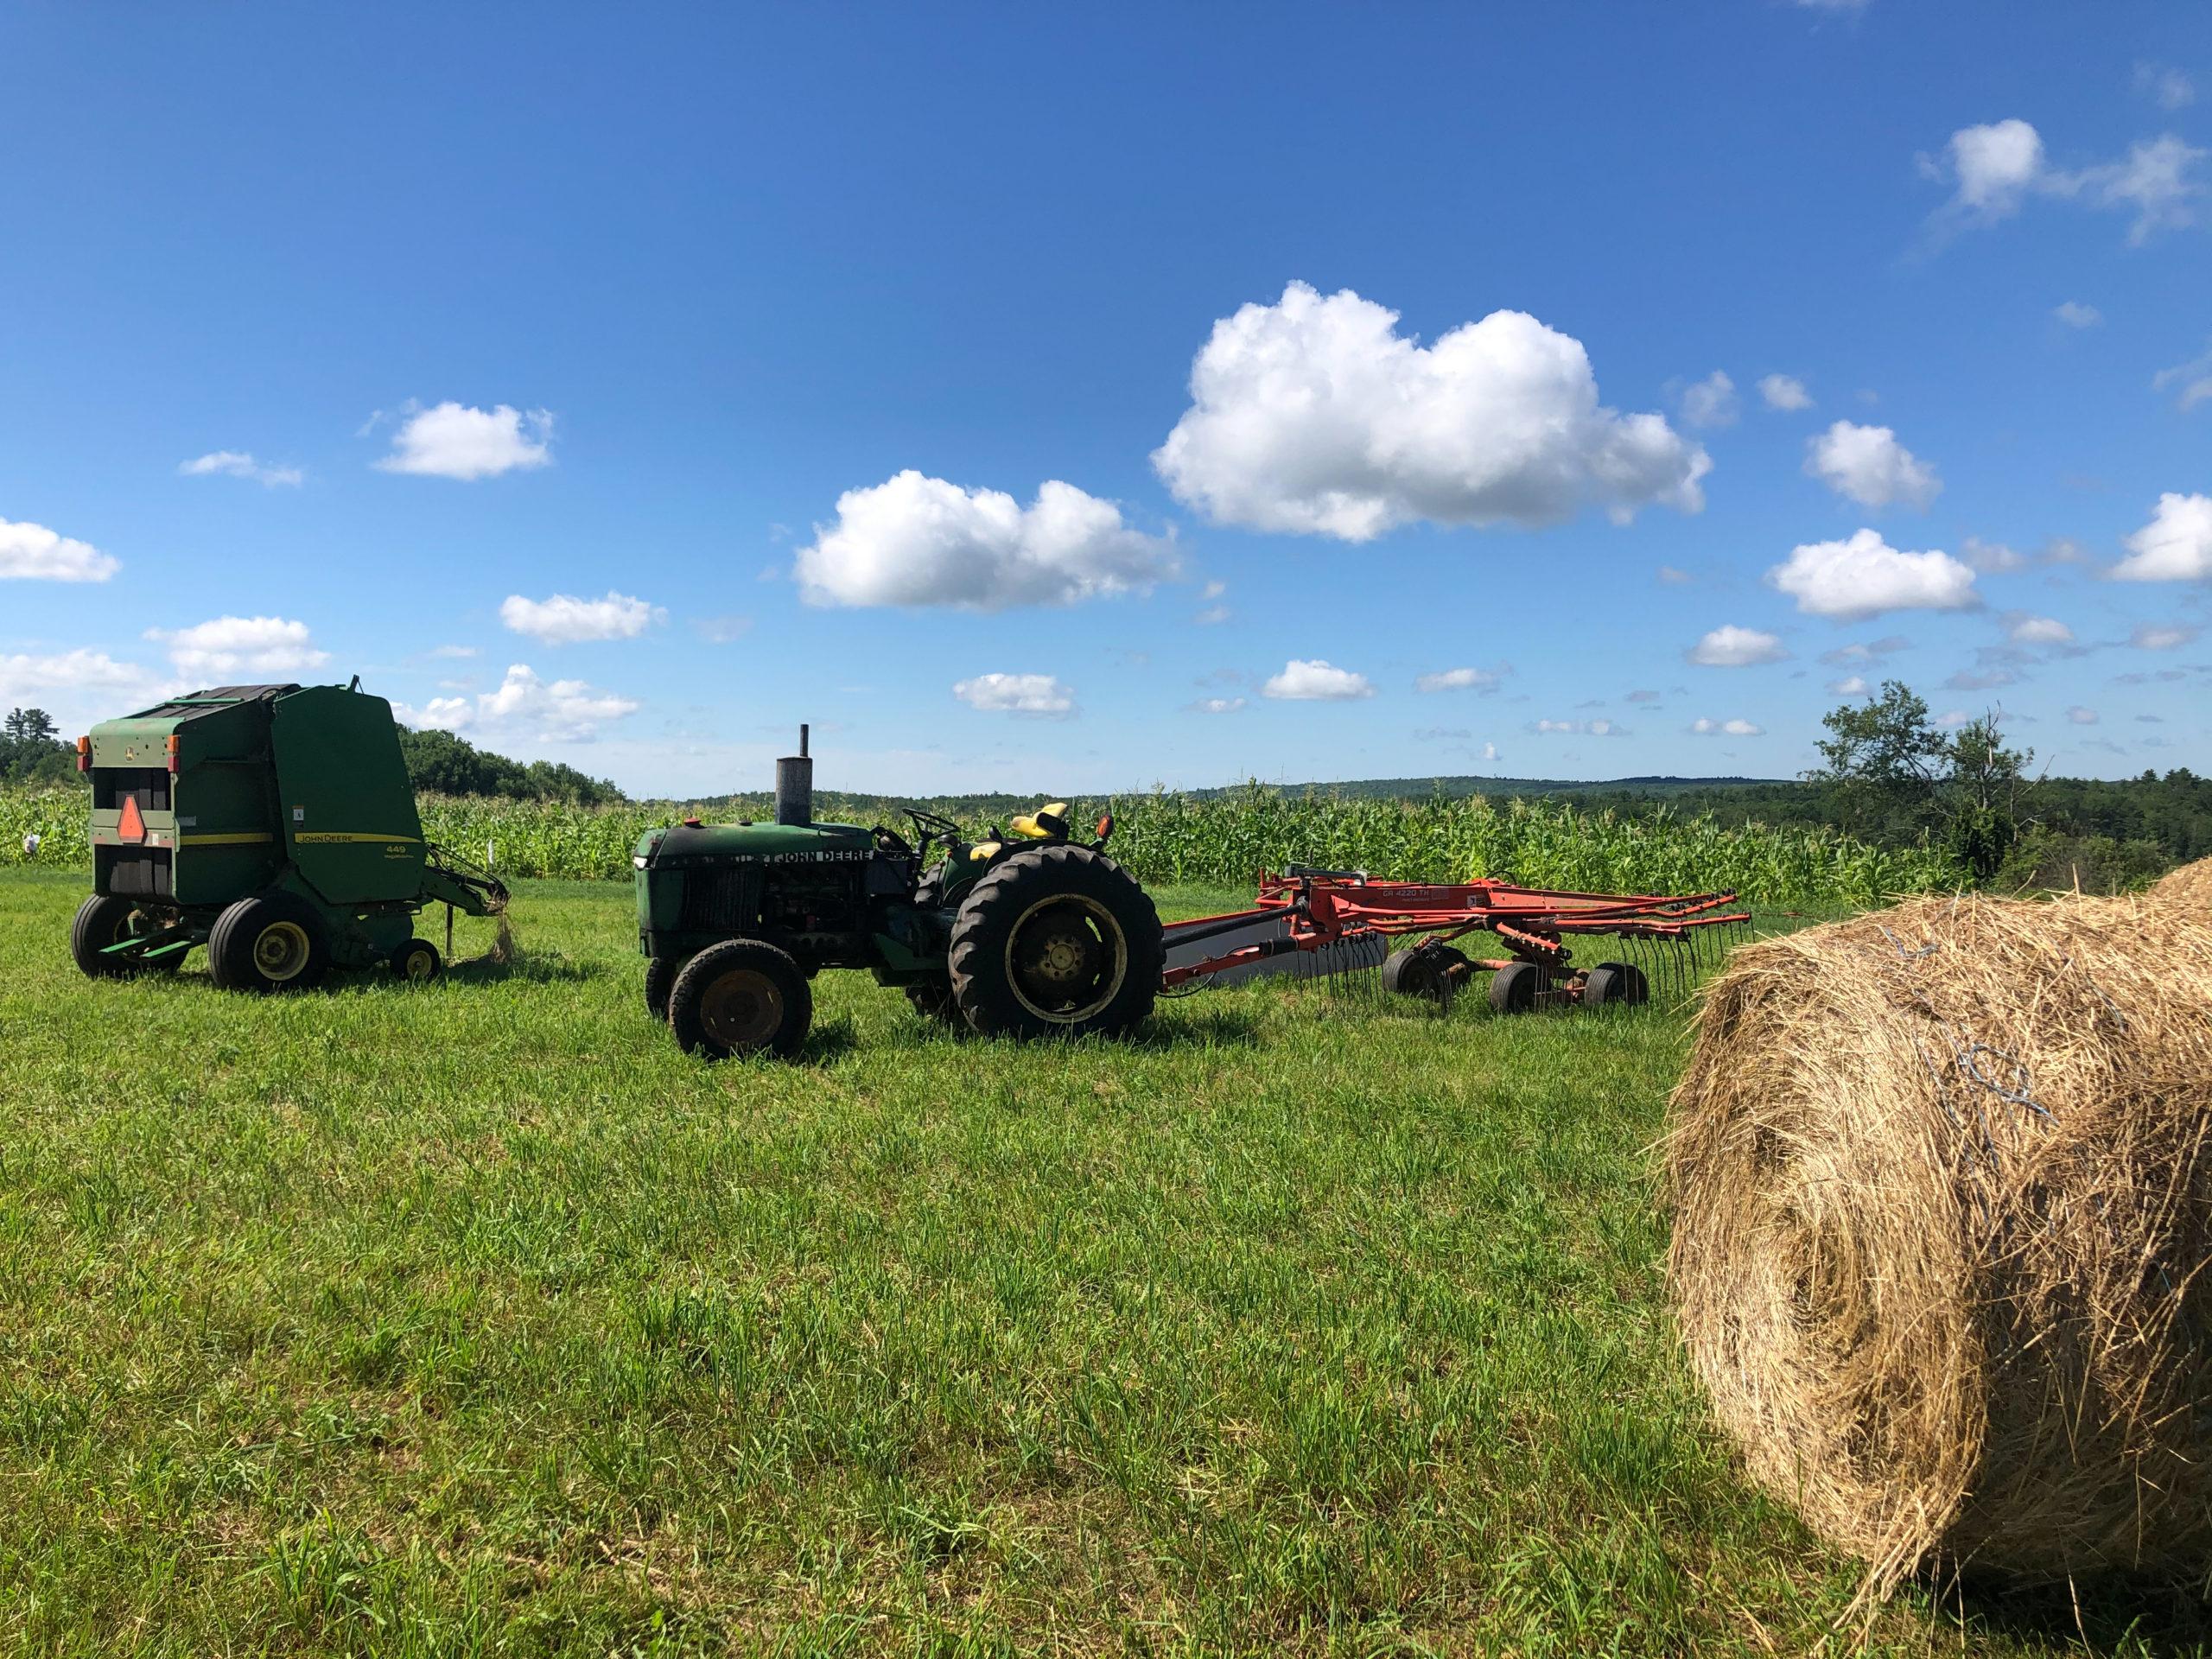 Liberation Farms